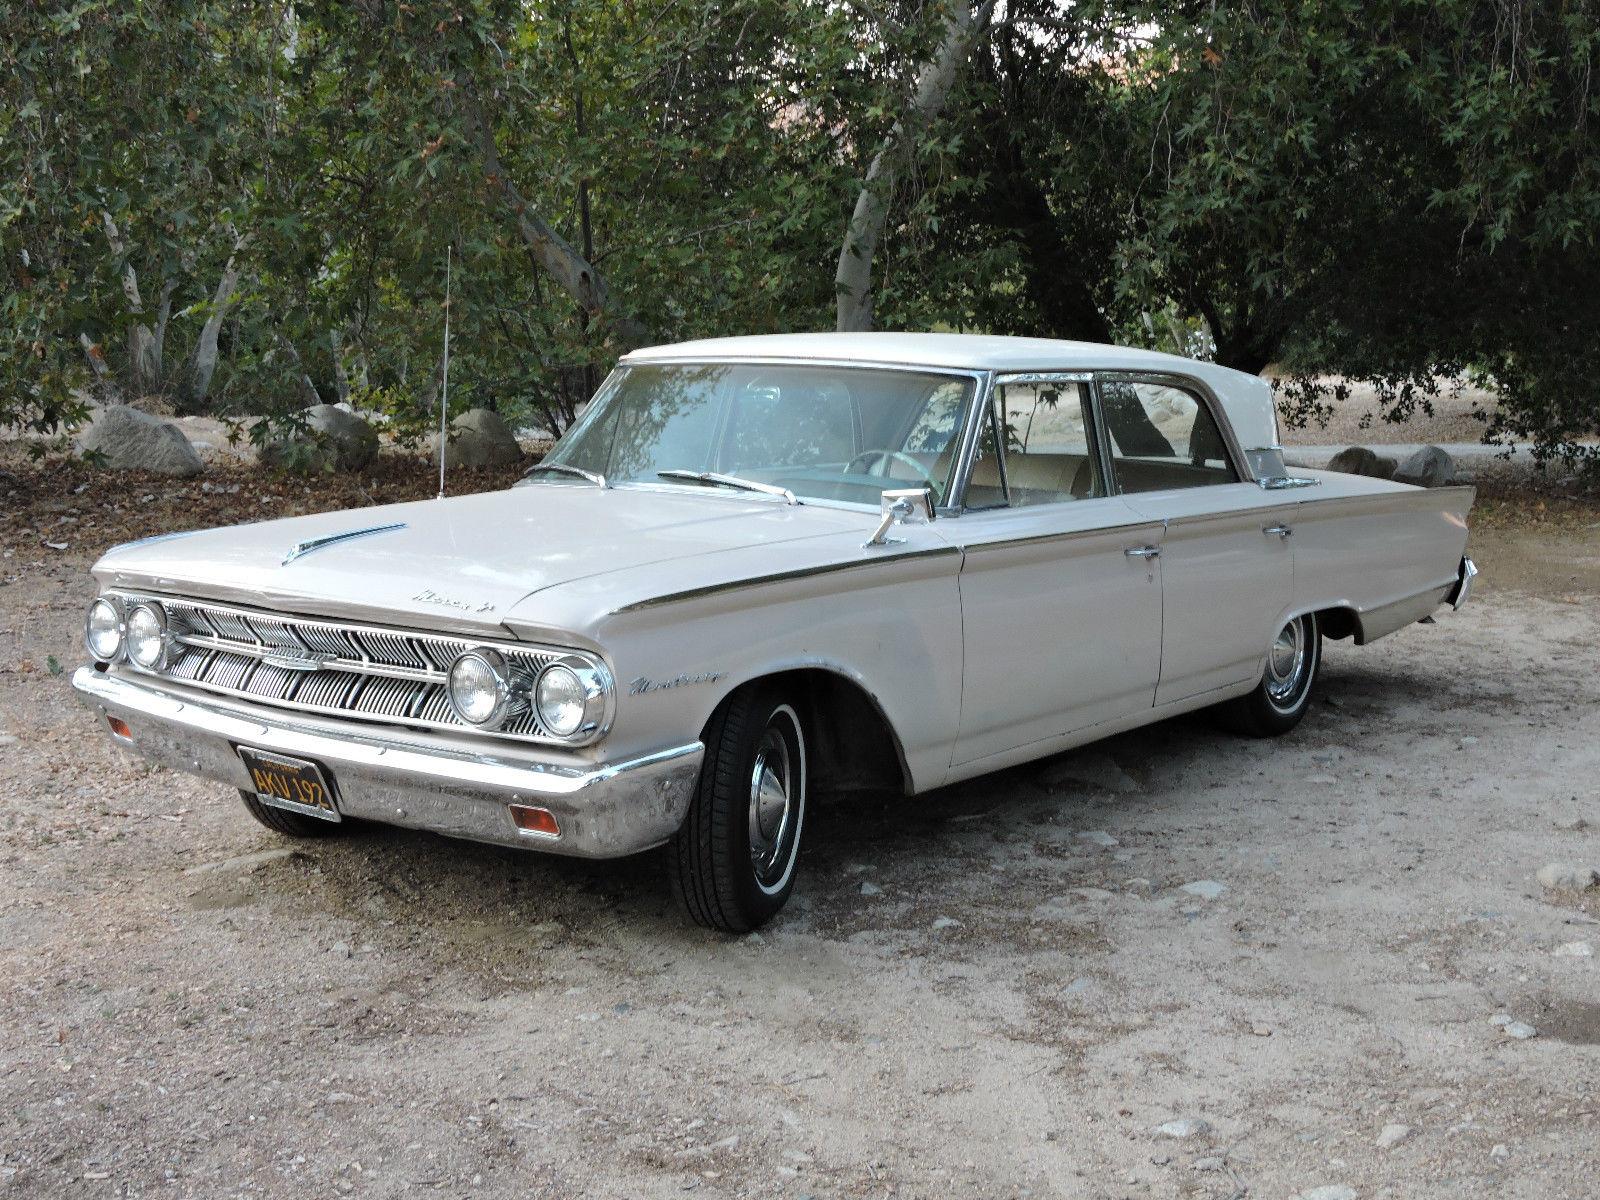 1963 Mercury Monterey Custom 4 Door Sedan. U201c